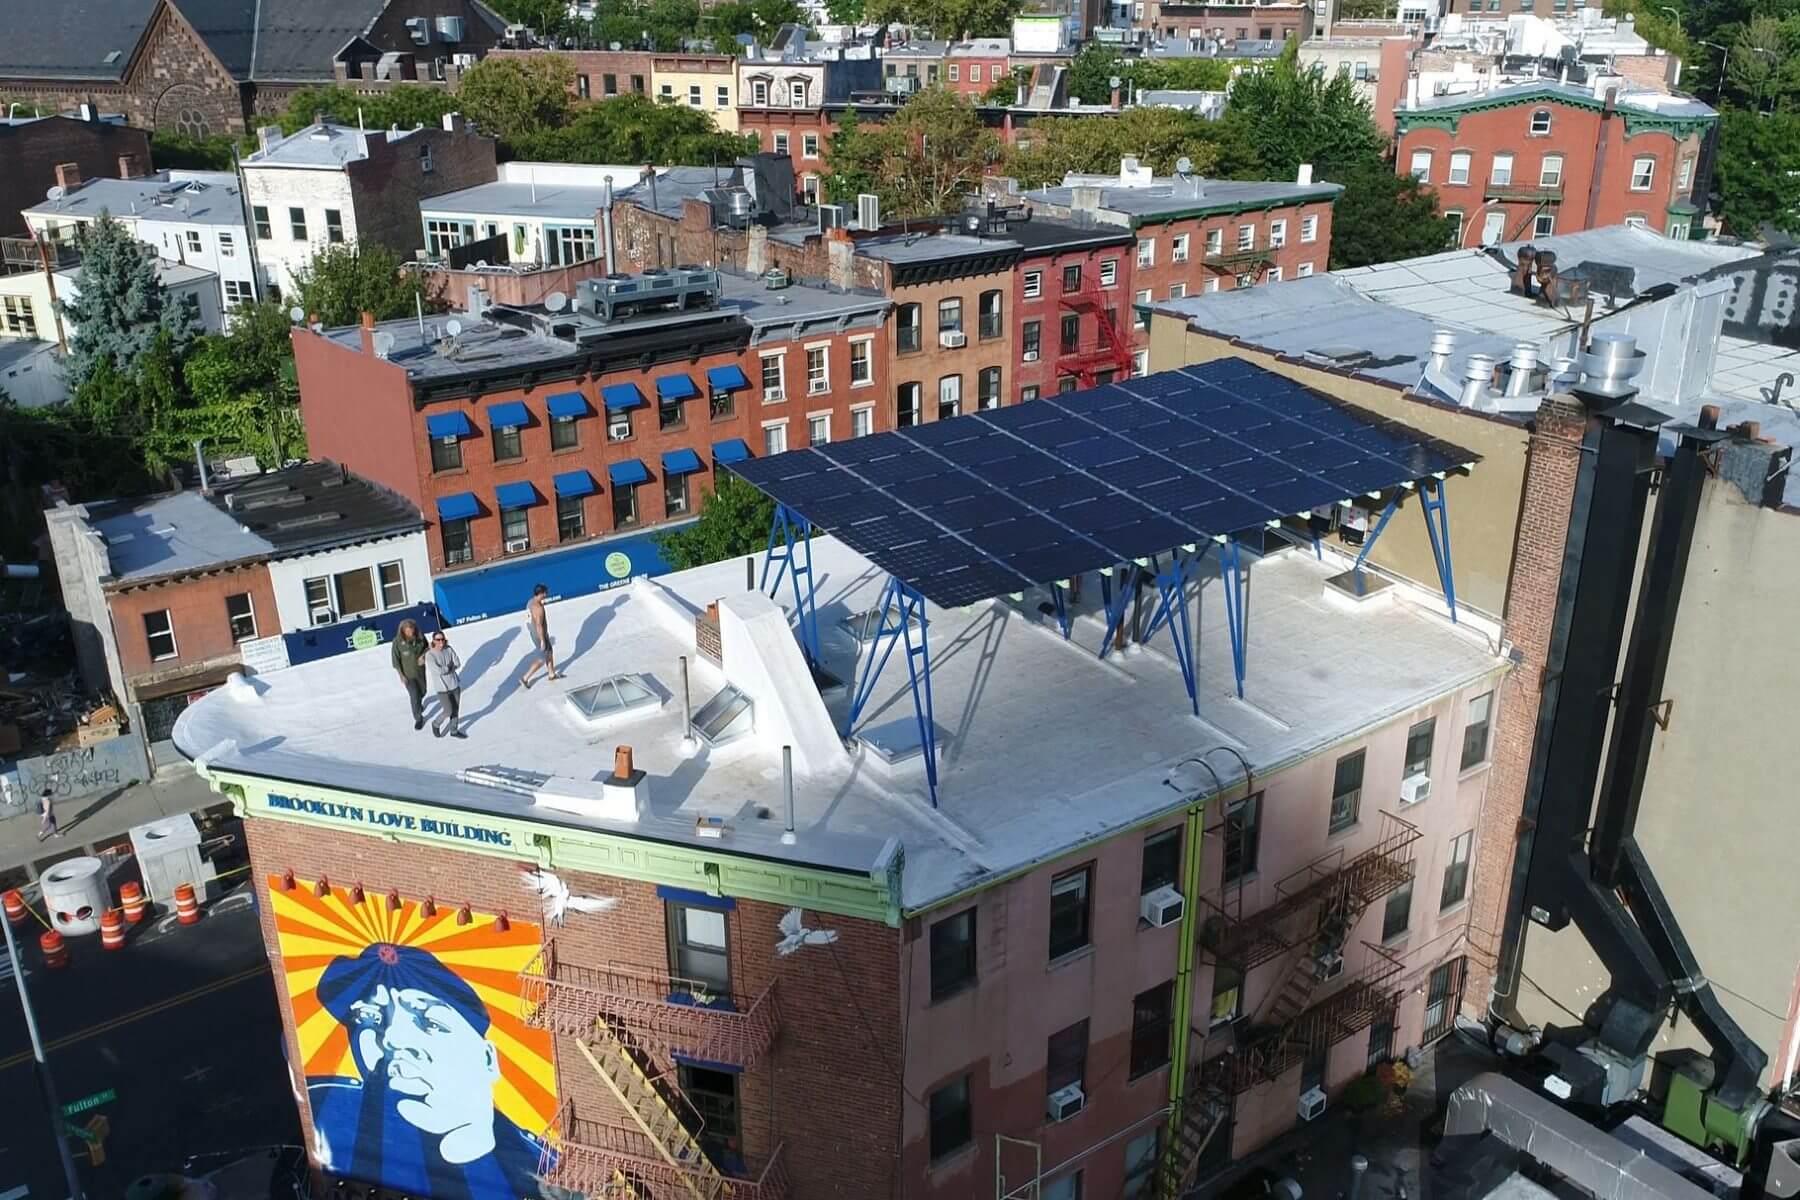 habana outpost solar canopy sustainably-minded